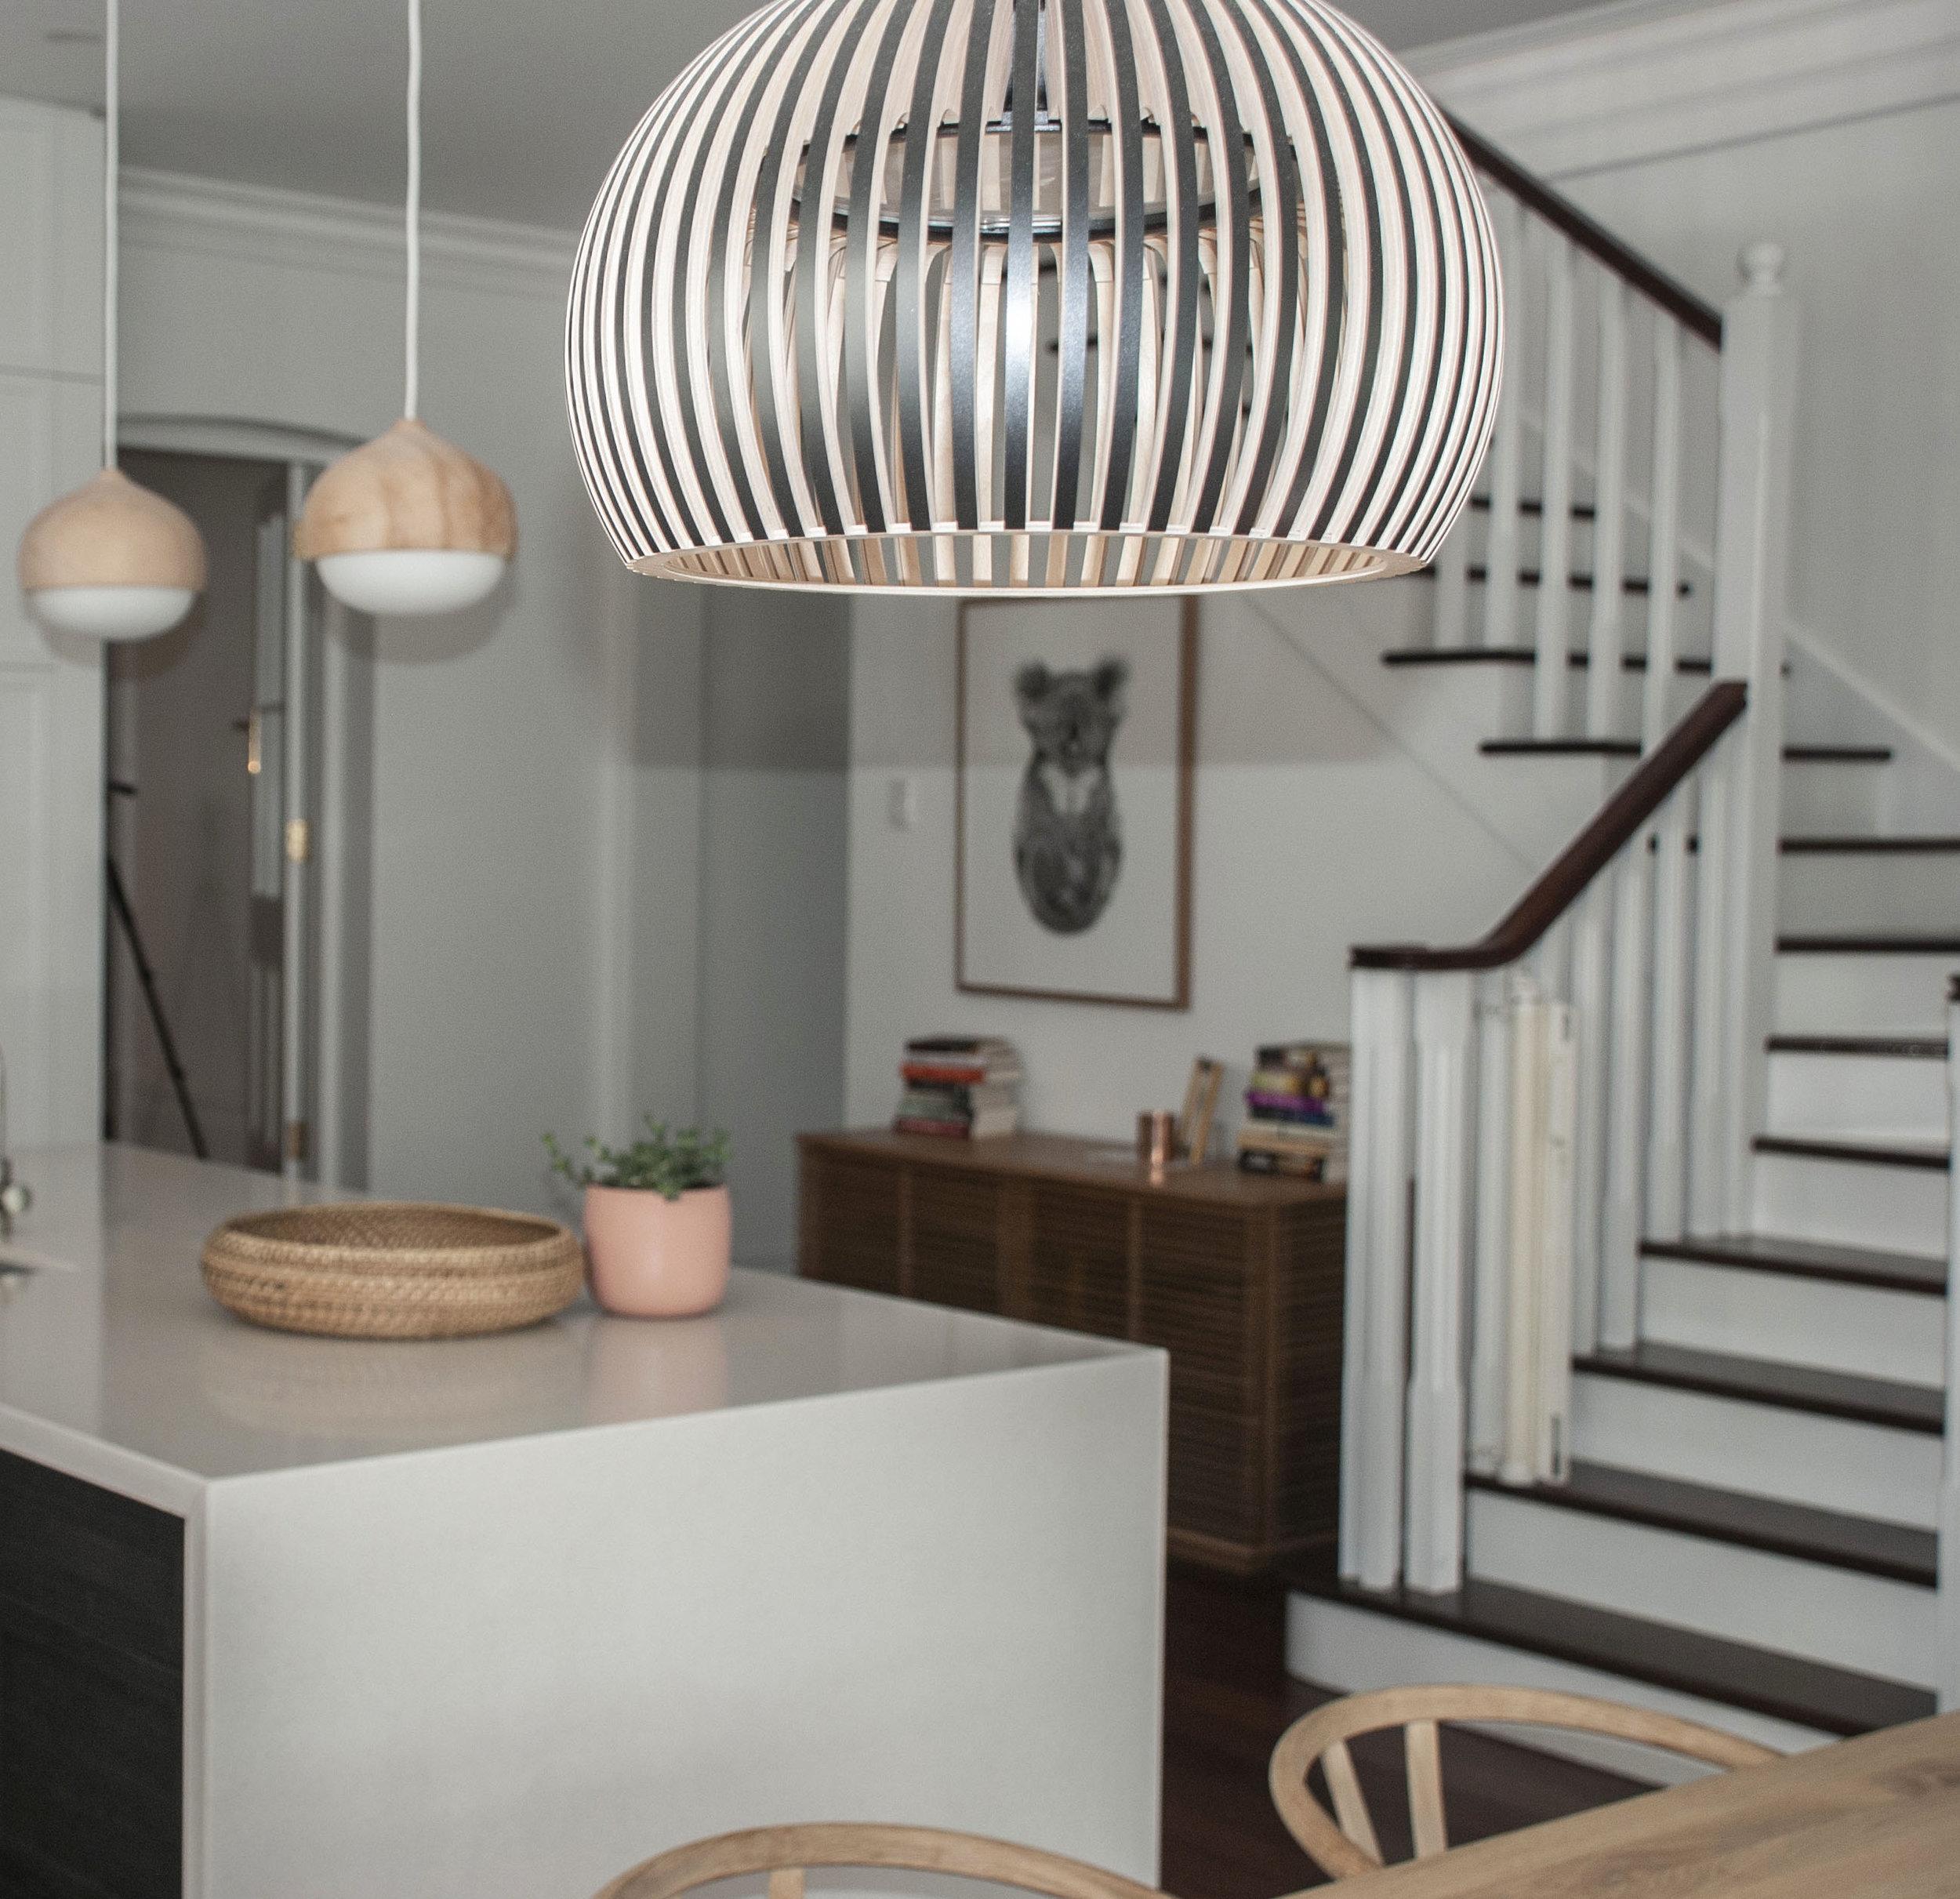 Turner Interior Design - Shenton park house - Kitchen 2.jpg